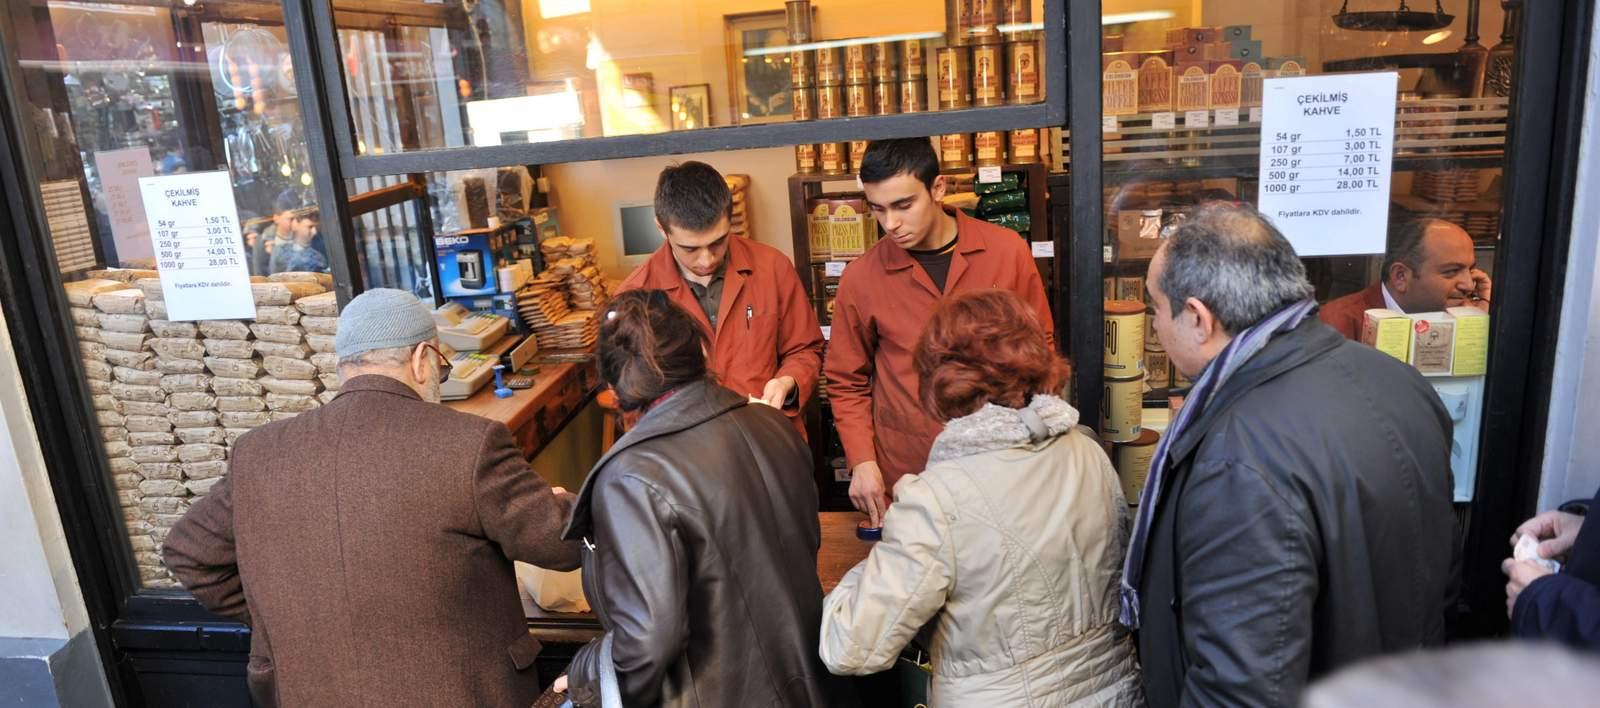 buying coffee